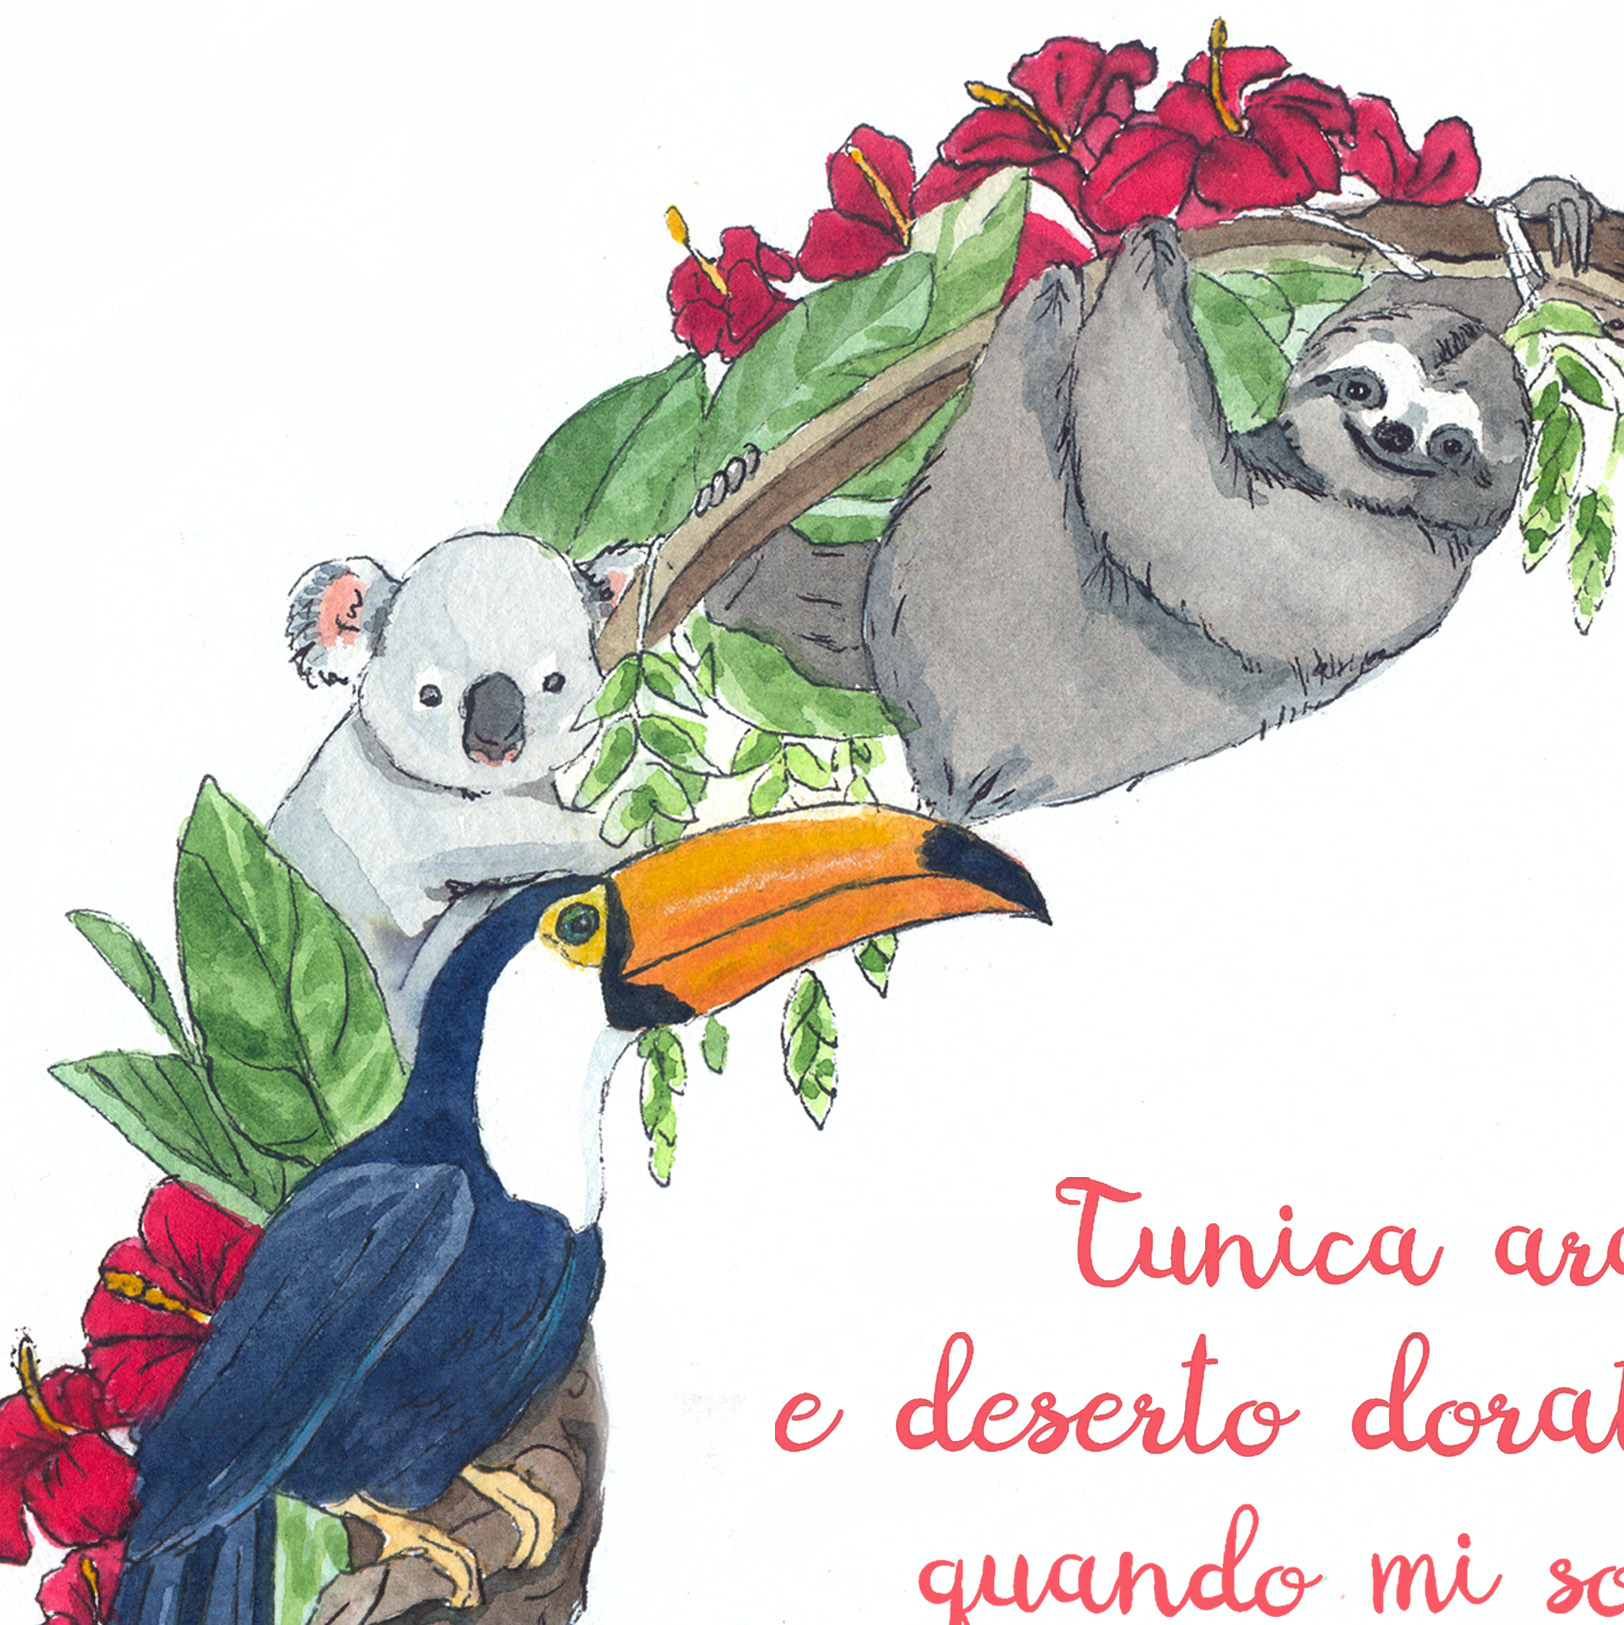 sloth and tucan watercolor detail